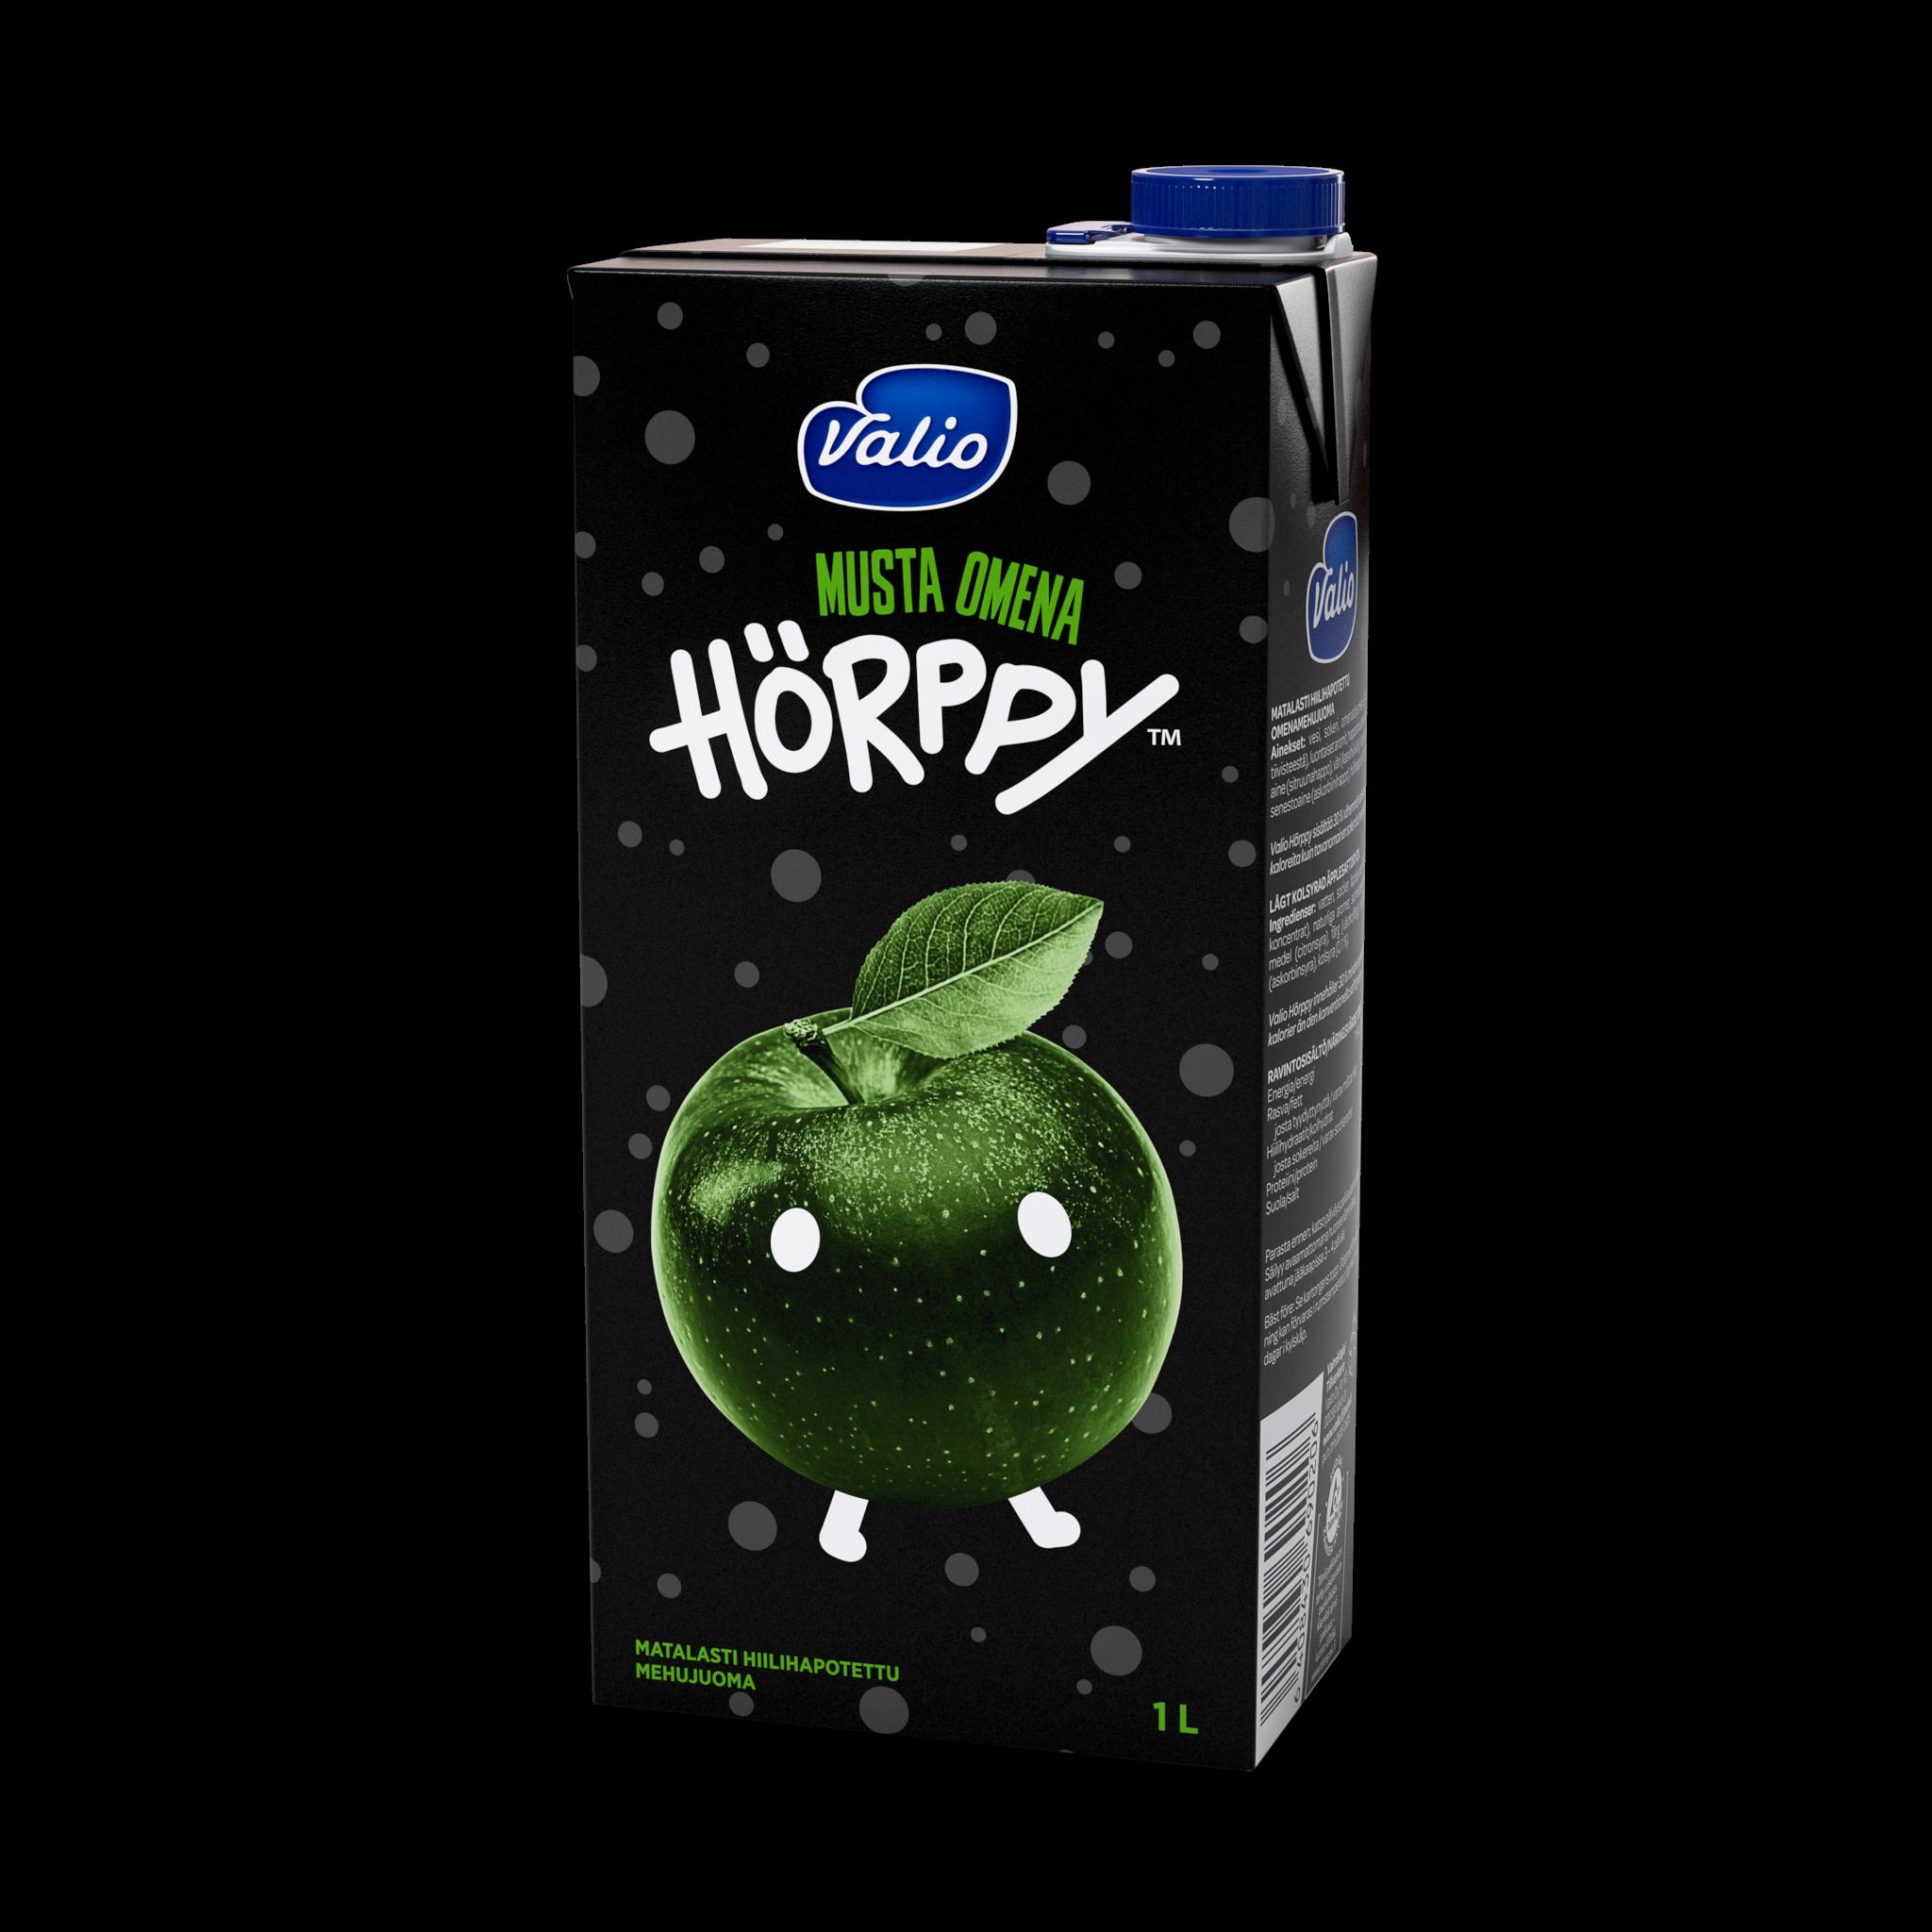 Valio HÖRPPY™ musta omena